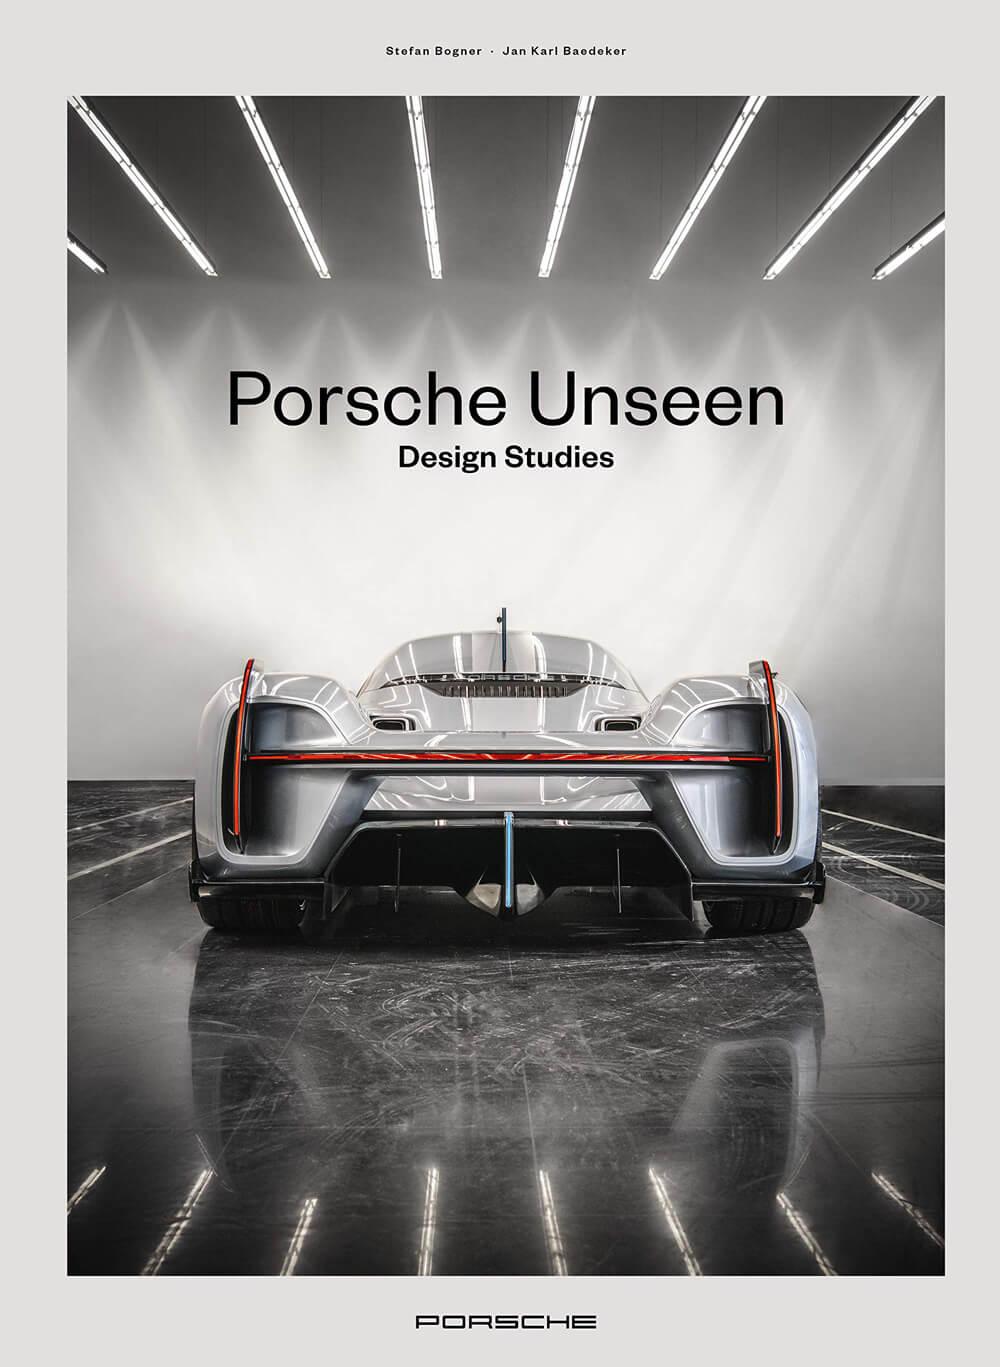 """Porsche Unseen"" shares unreleased concept cars from 2005-2019. Credit: Porsche"